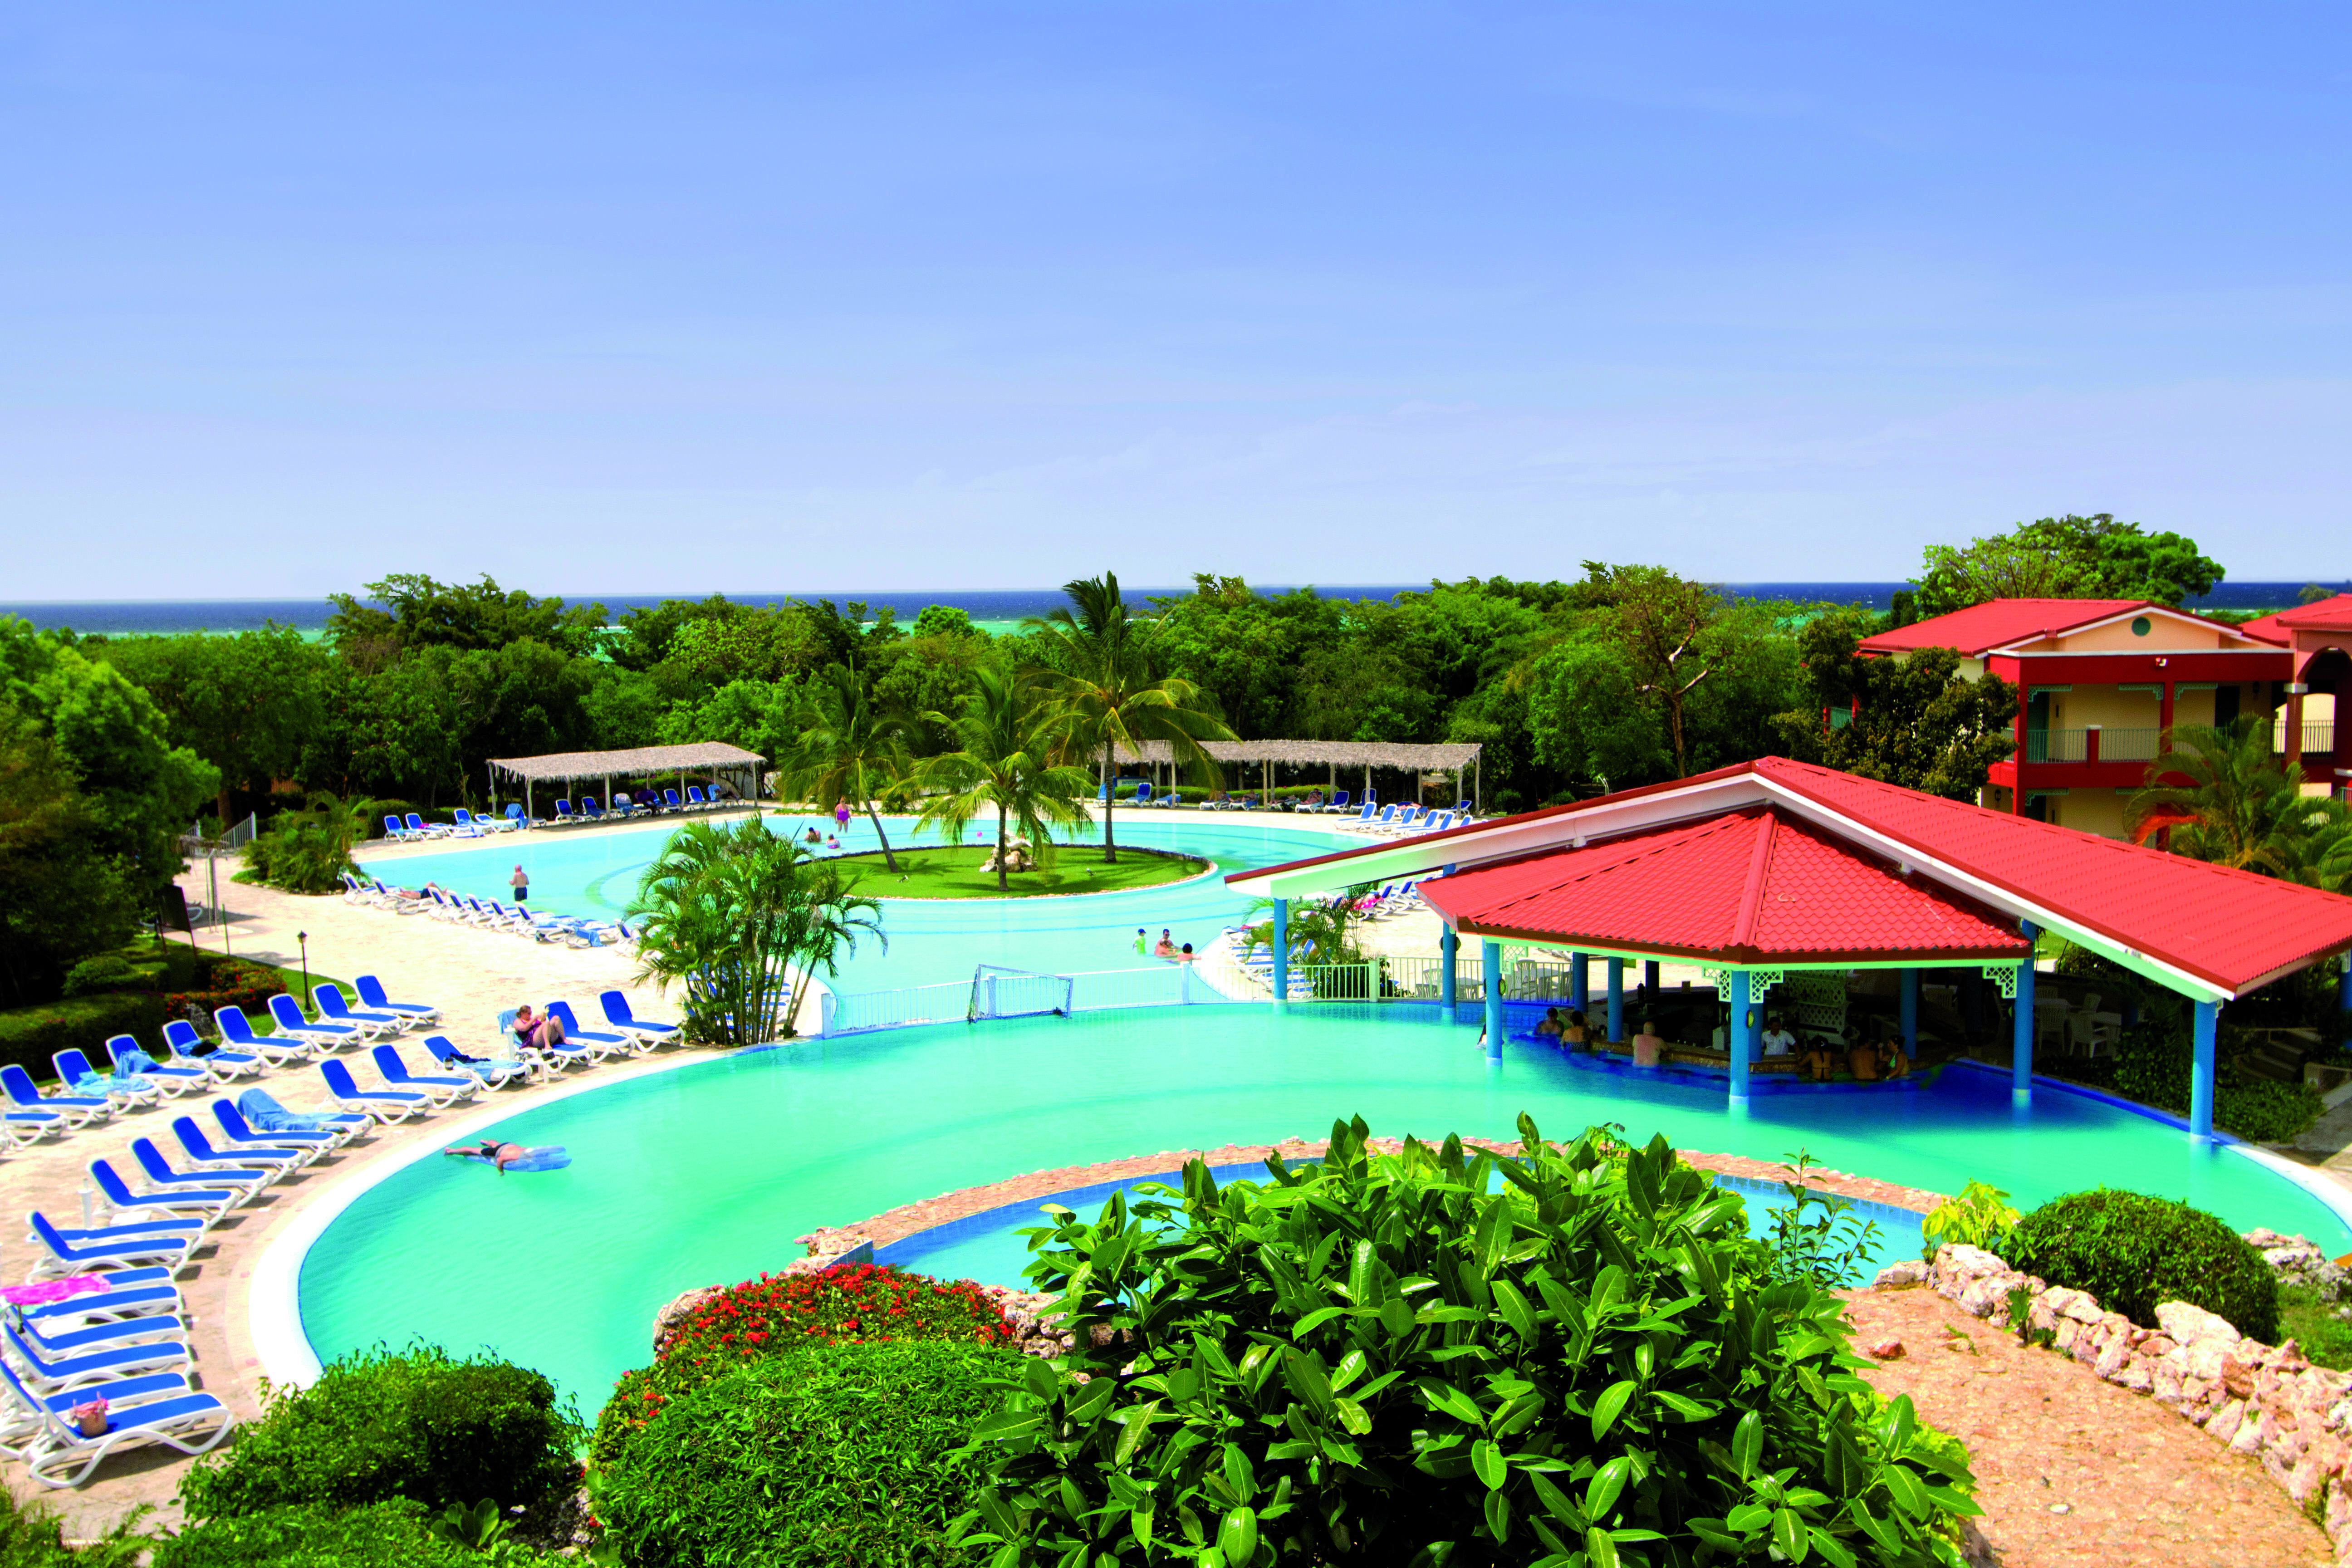 Memories Resorts Spa Announces Acquisition Of Resort In Holguin Cuba